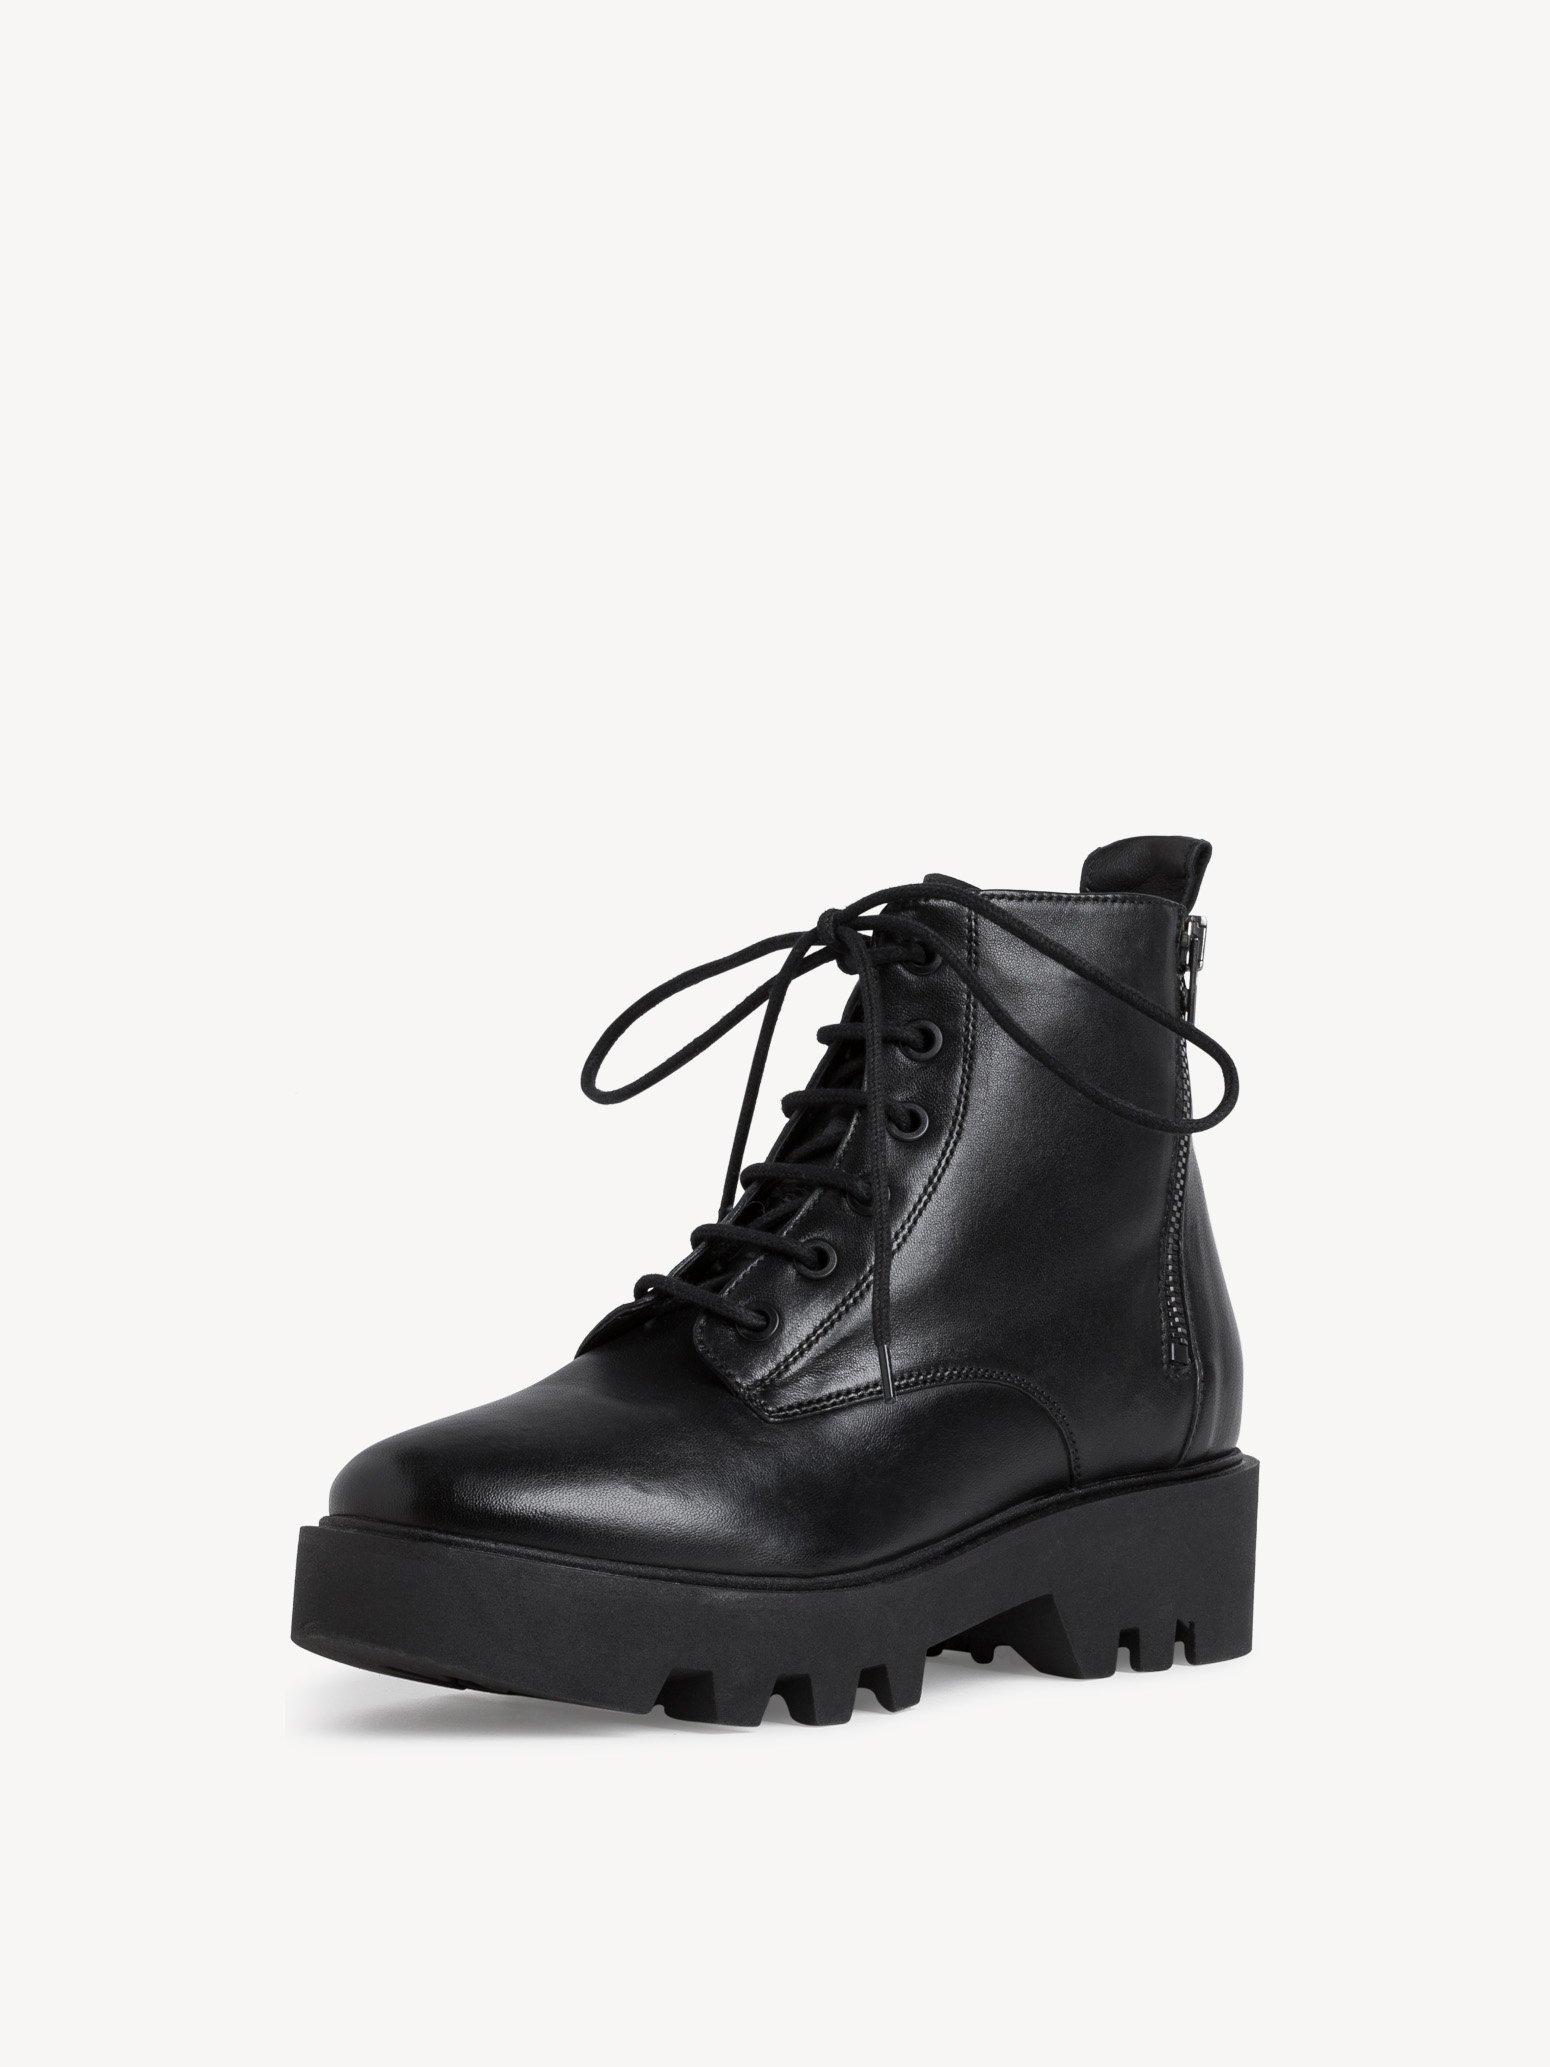 Ботинки Tamaris 1-1-25202-37-003